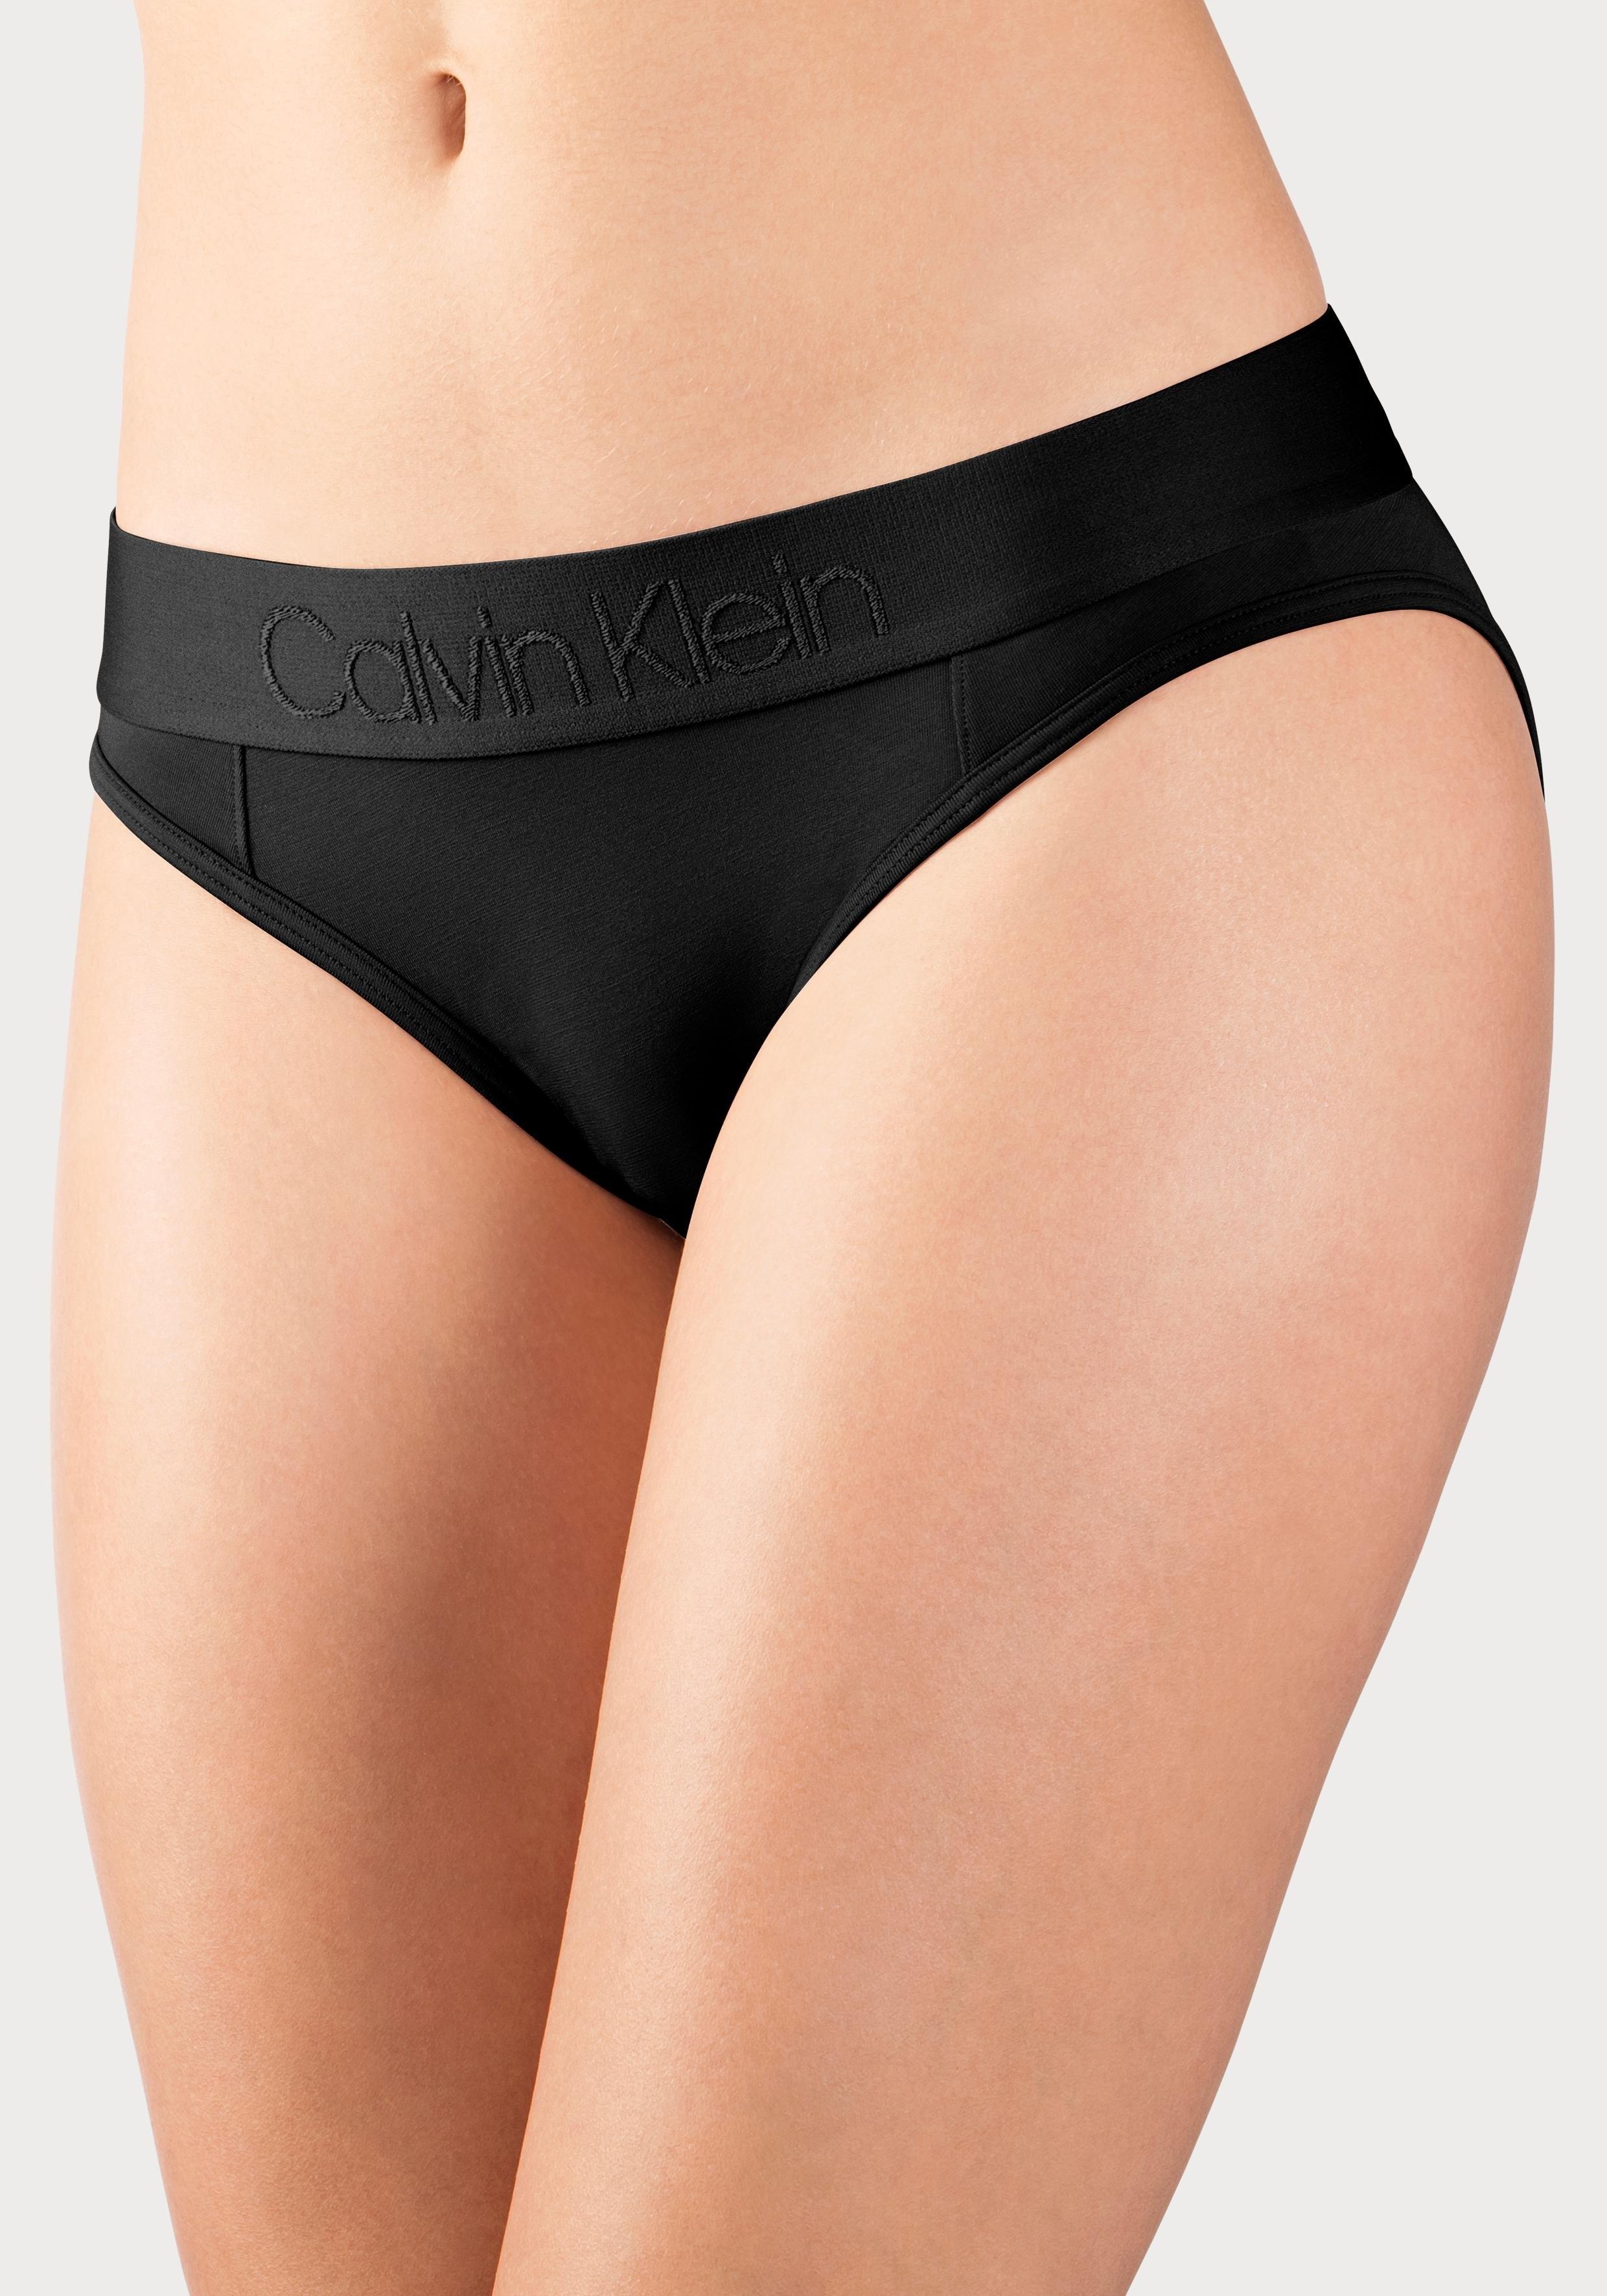 Calvin Klein Bikinibroekje TONAL LOGO met in kleur bijpassende logoband nu online kopen bij Lascana